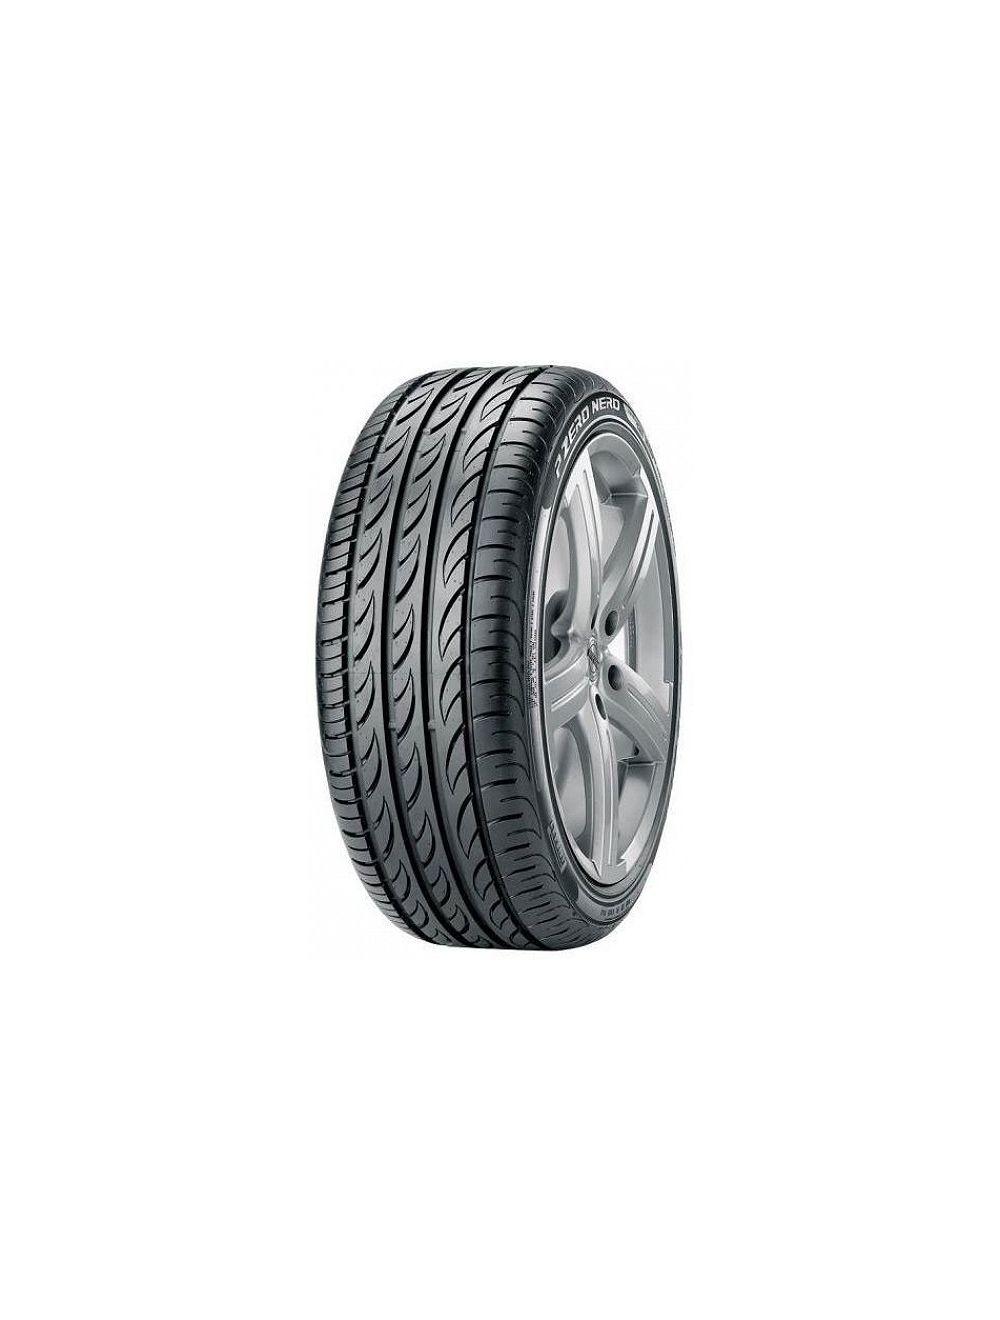 Pirelli 195/45R16 V PZero Nero GT XL Nyári gumi